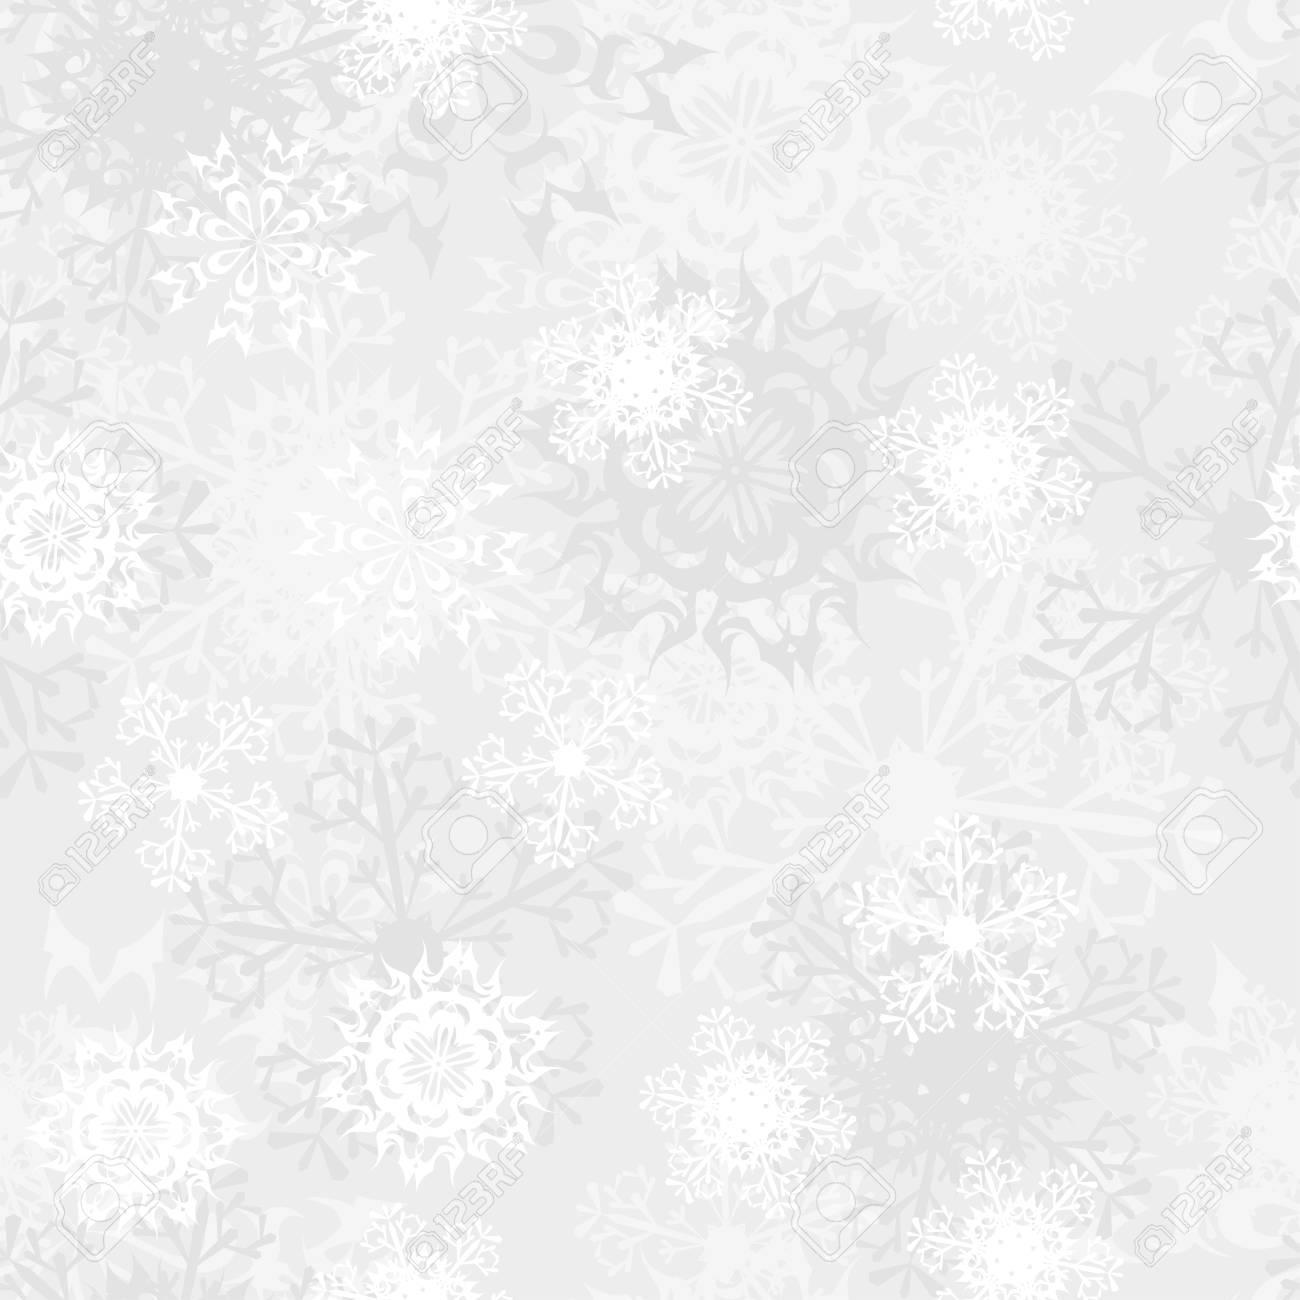 Seamless snowflake patterns. Fully editable illustration. Stock Vector - 16571572